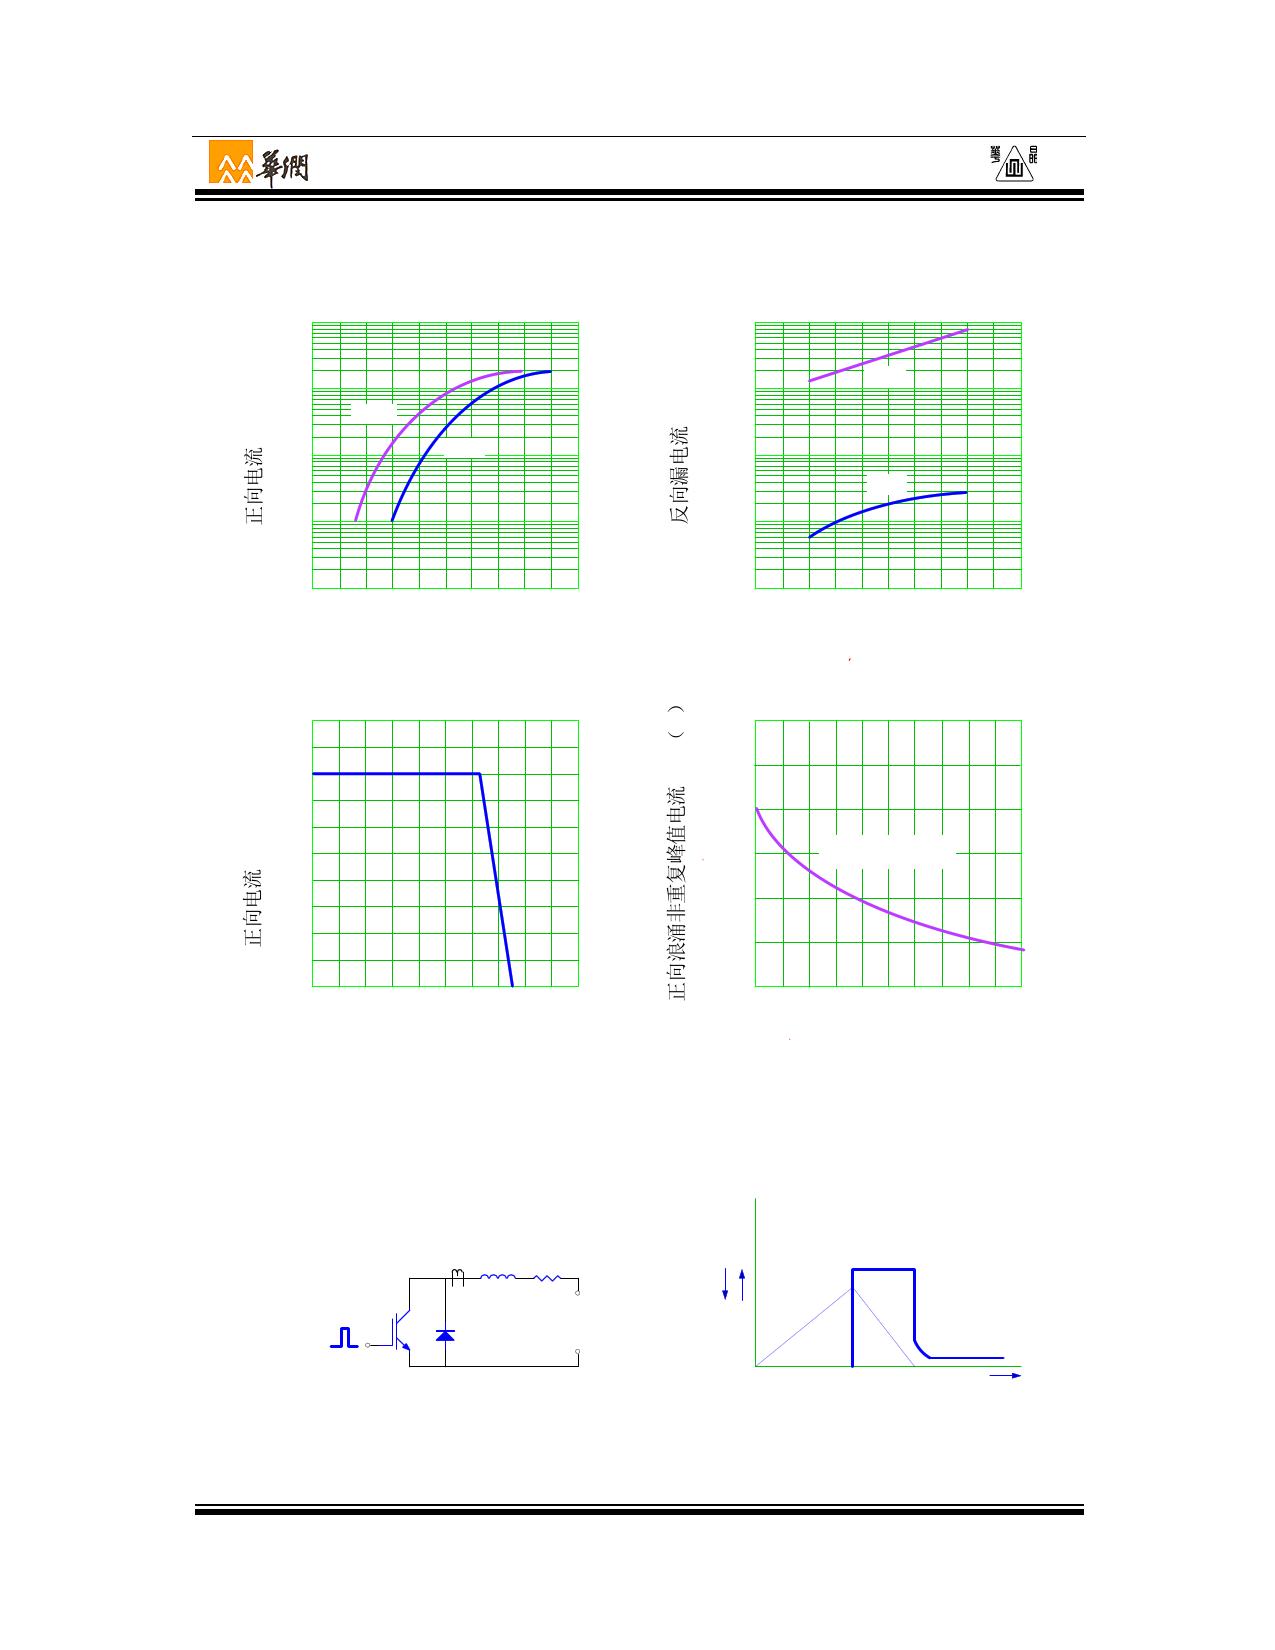 2CR084A8C pdf, ピン配列